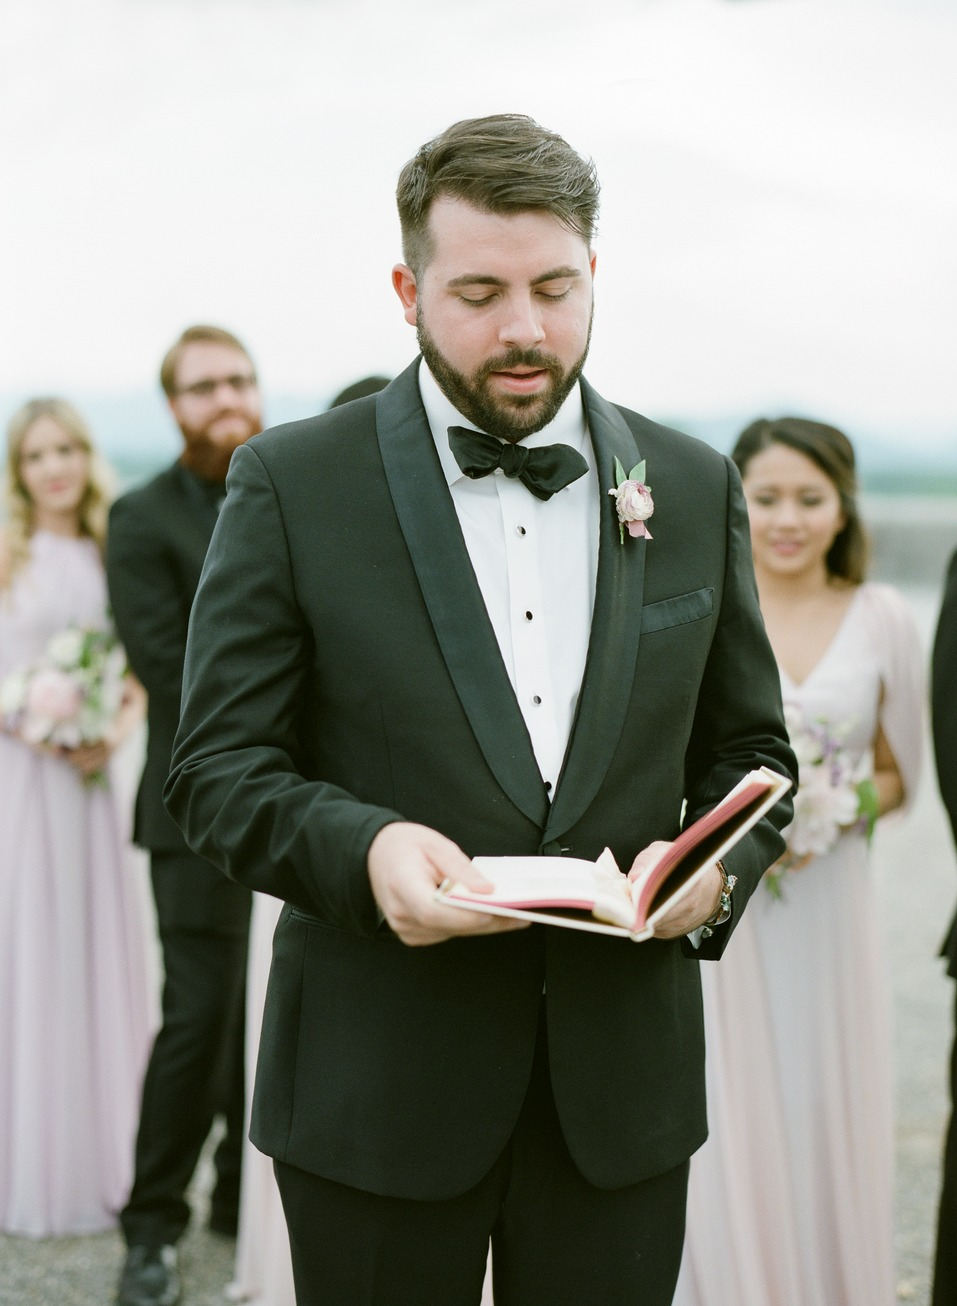 rebecca-clay-wedding-north-carolina-reading-bridesman-103228807.jpg